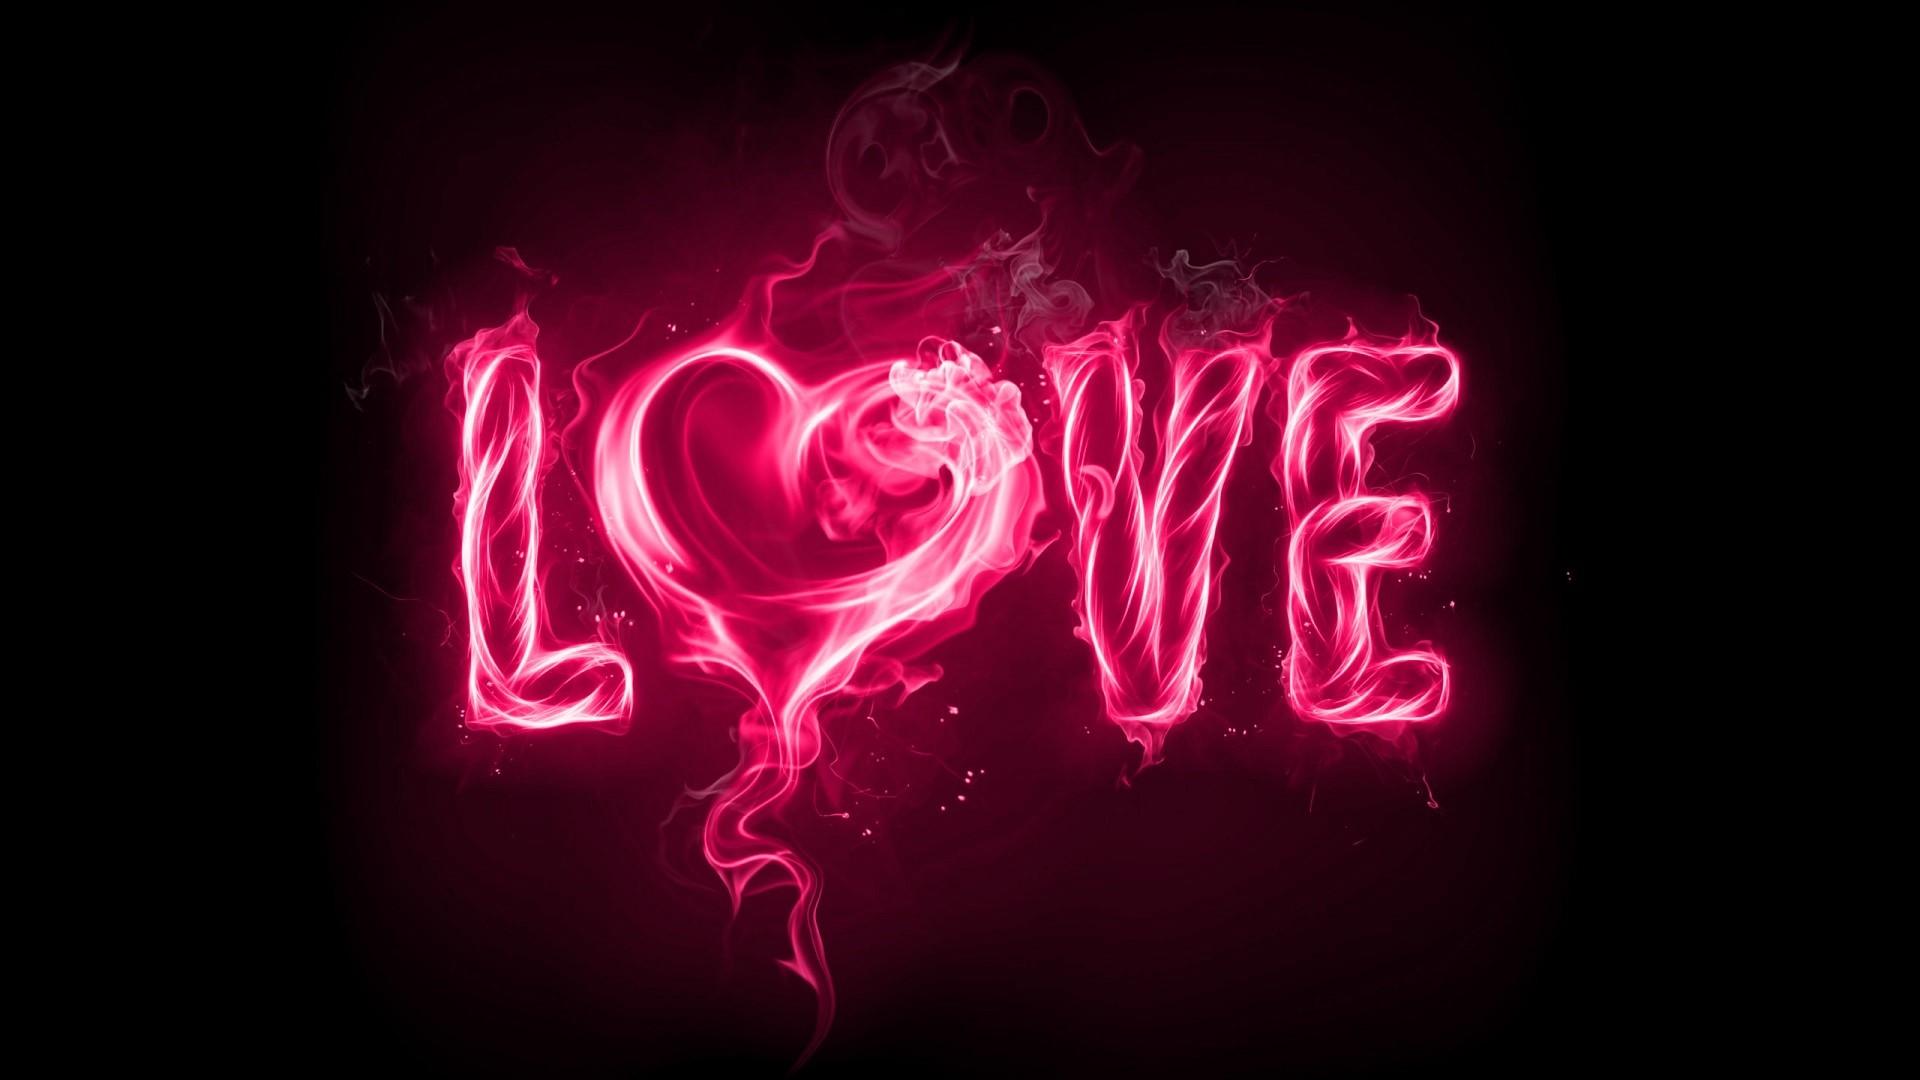 wallpaper of true love (65+ images)